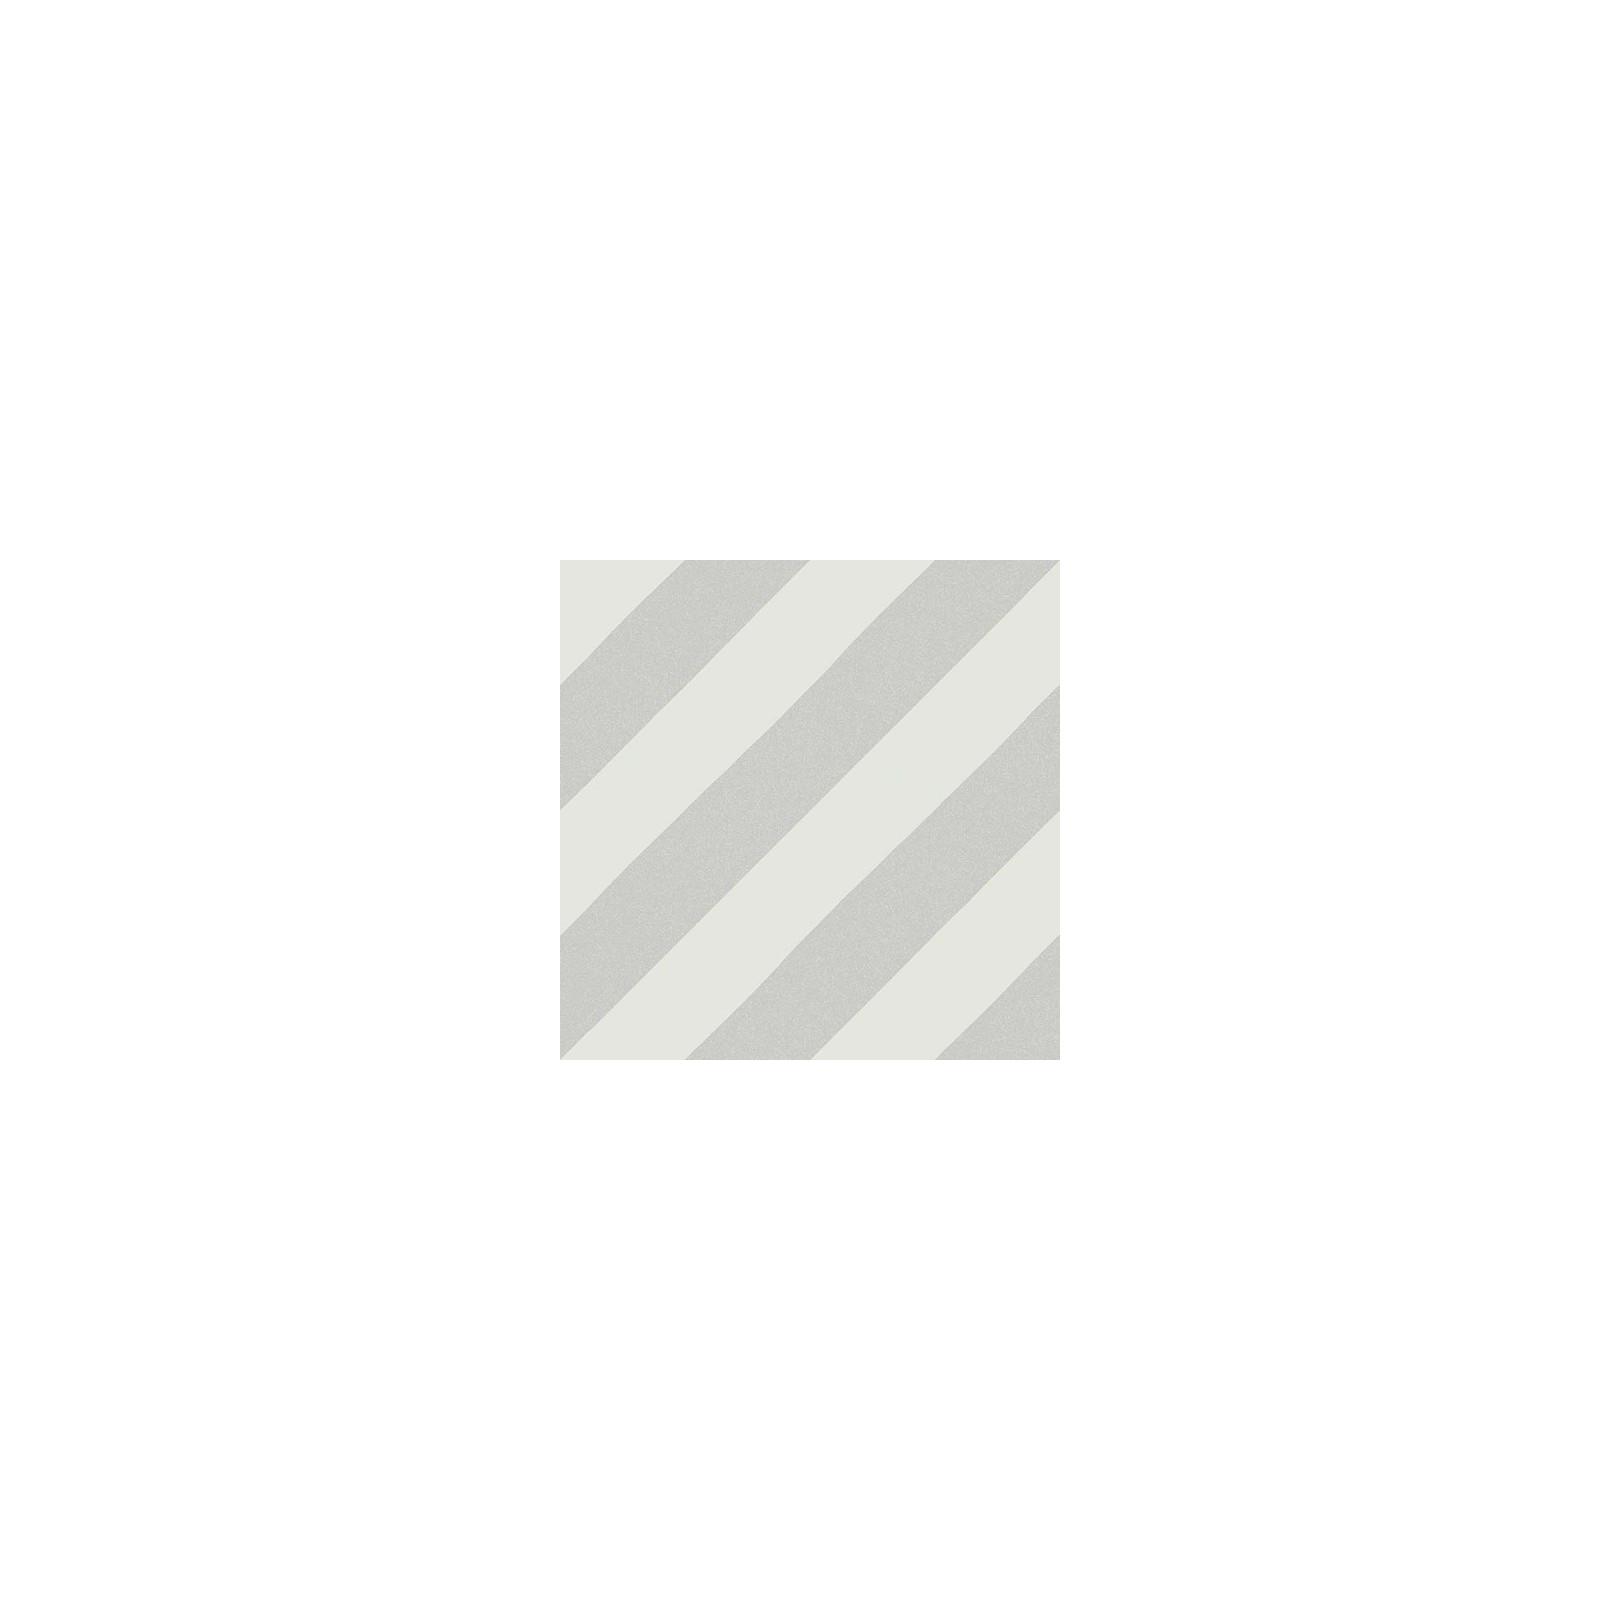 Carrelage grès cérame effet carreau ciment Maori Goroka (5 couleurs), 20c20cm